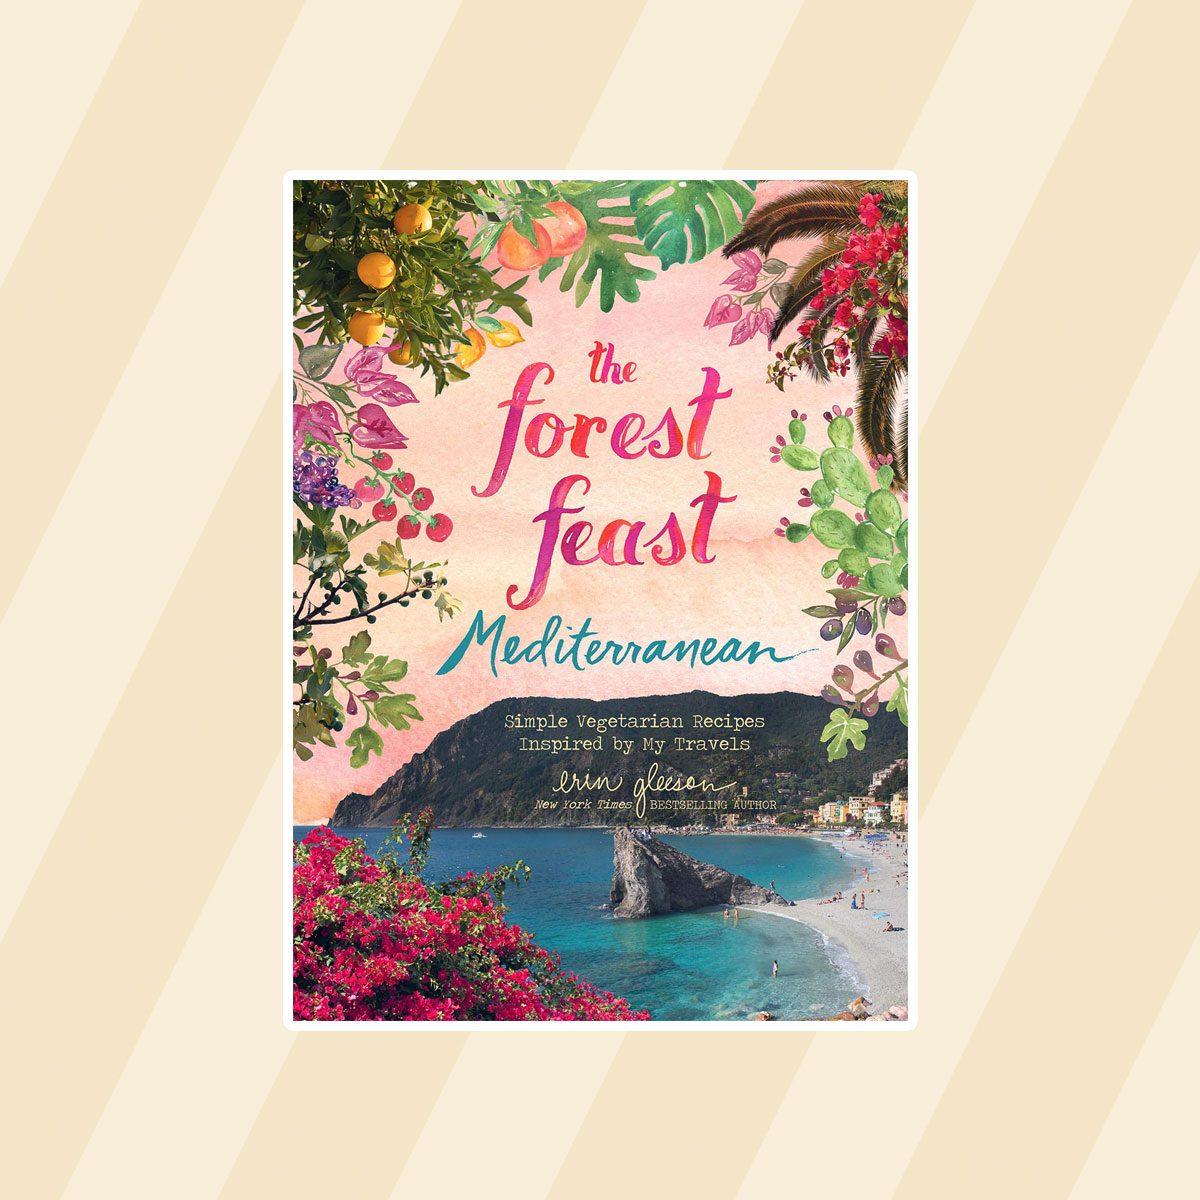 The Forest Feast Mediterranean